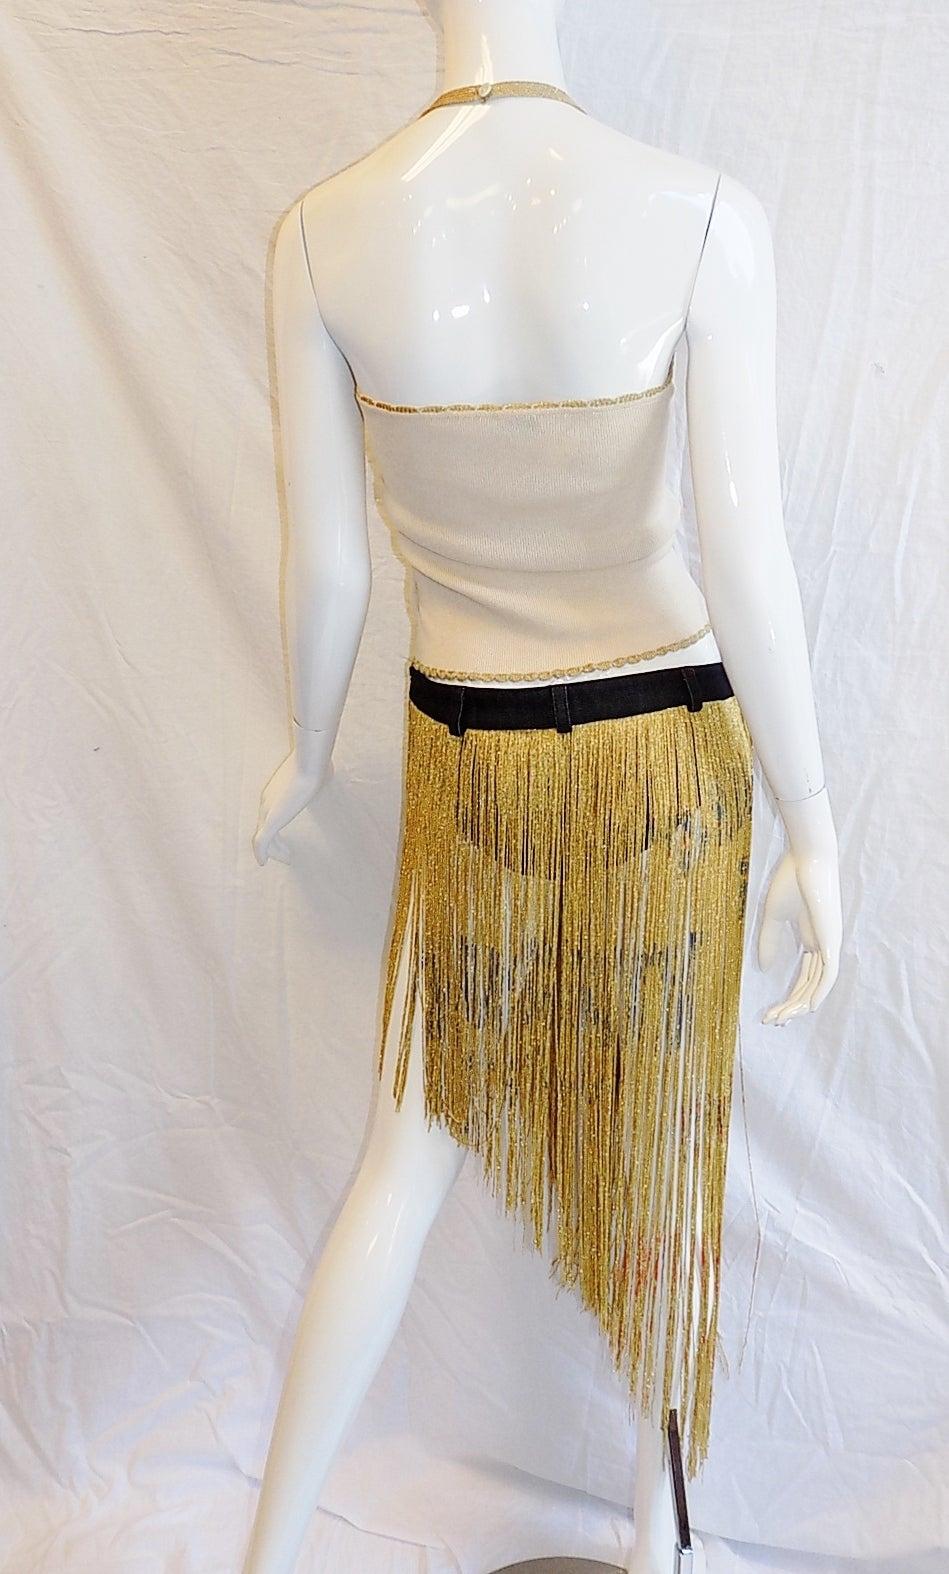 Dolce and Gabbana Metallic fringe Burlesque skirt and top ...